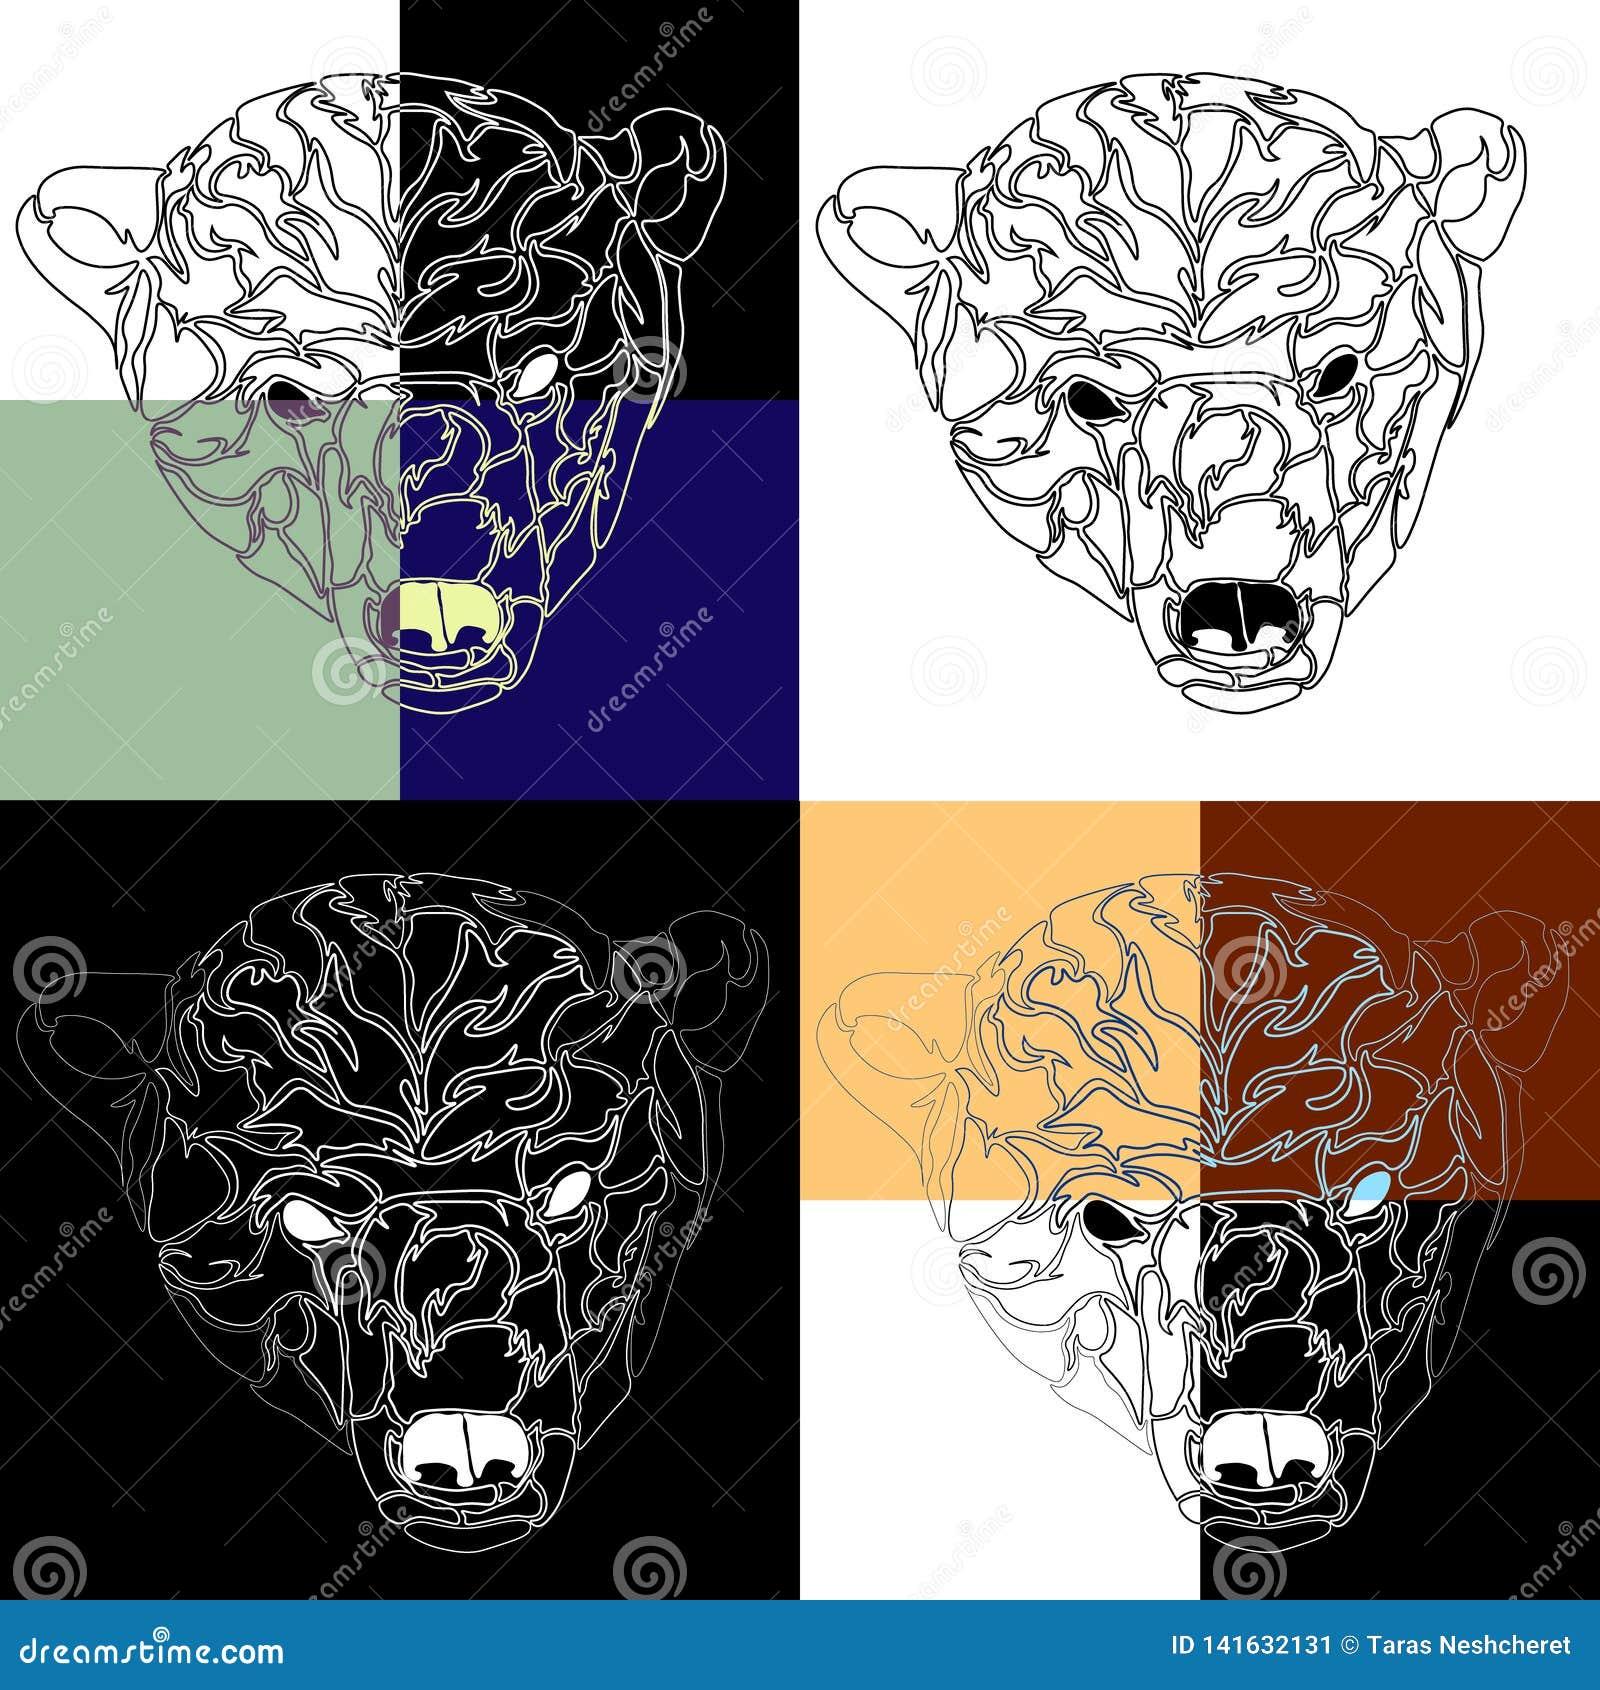 The head of the polar bear tattoo background